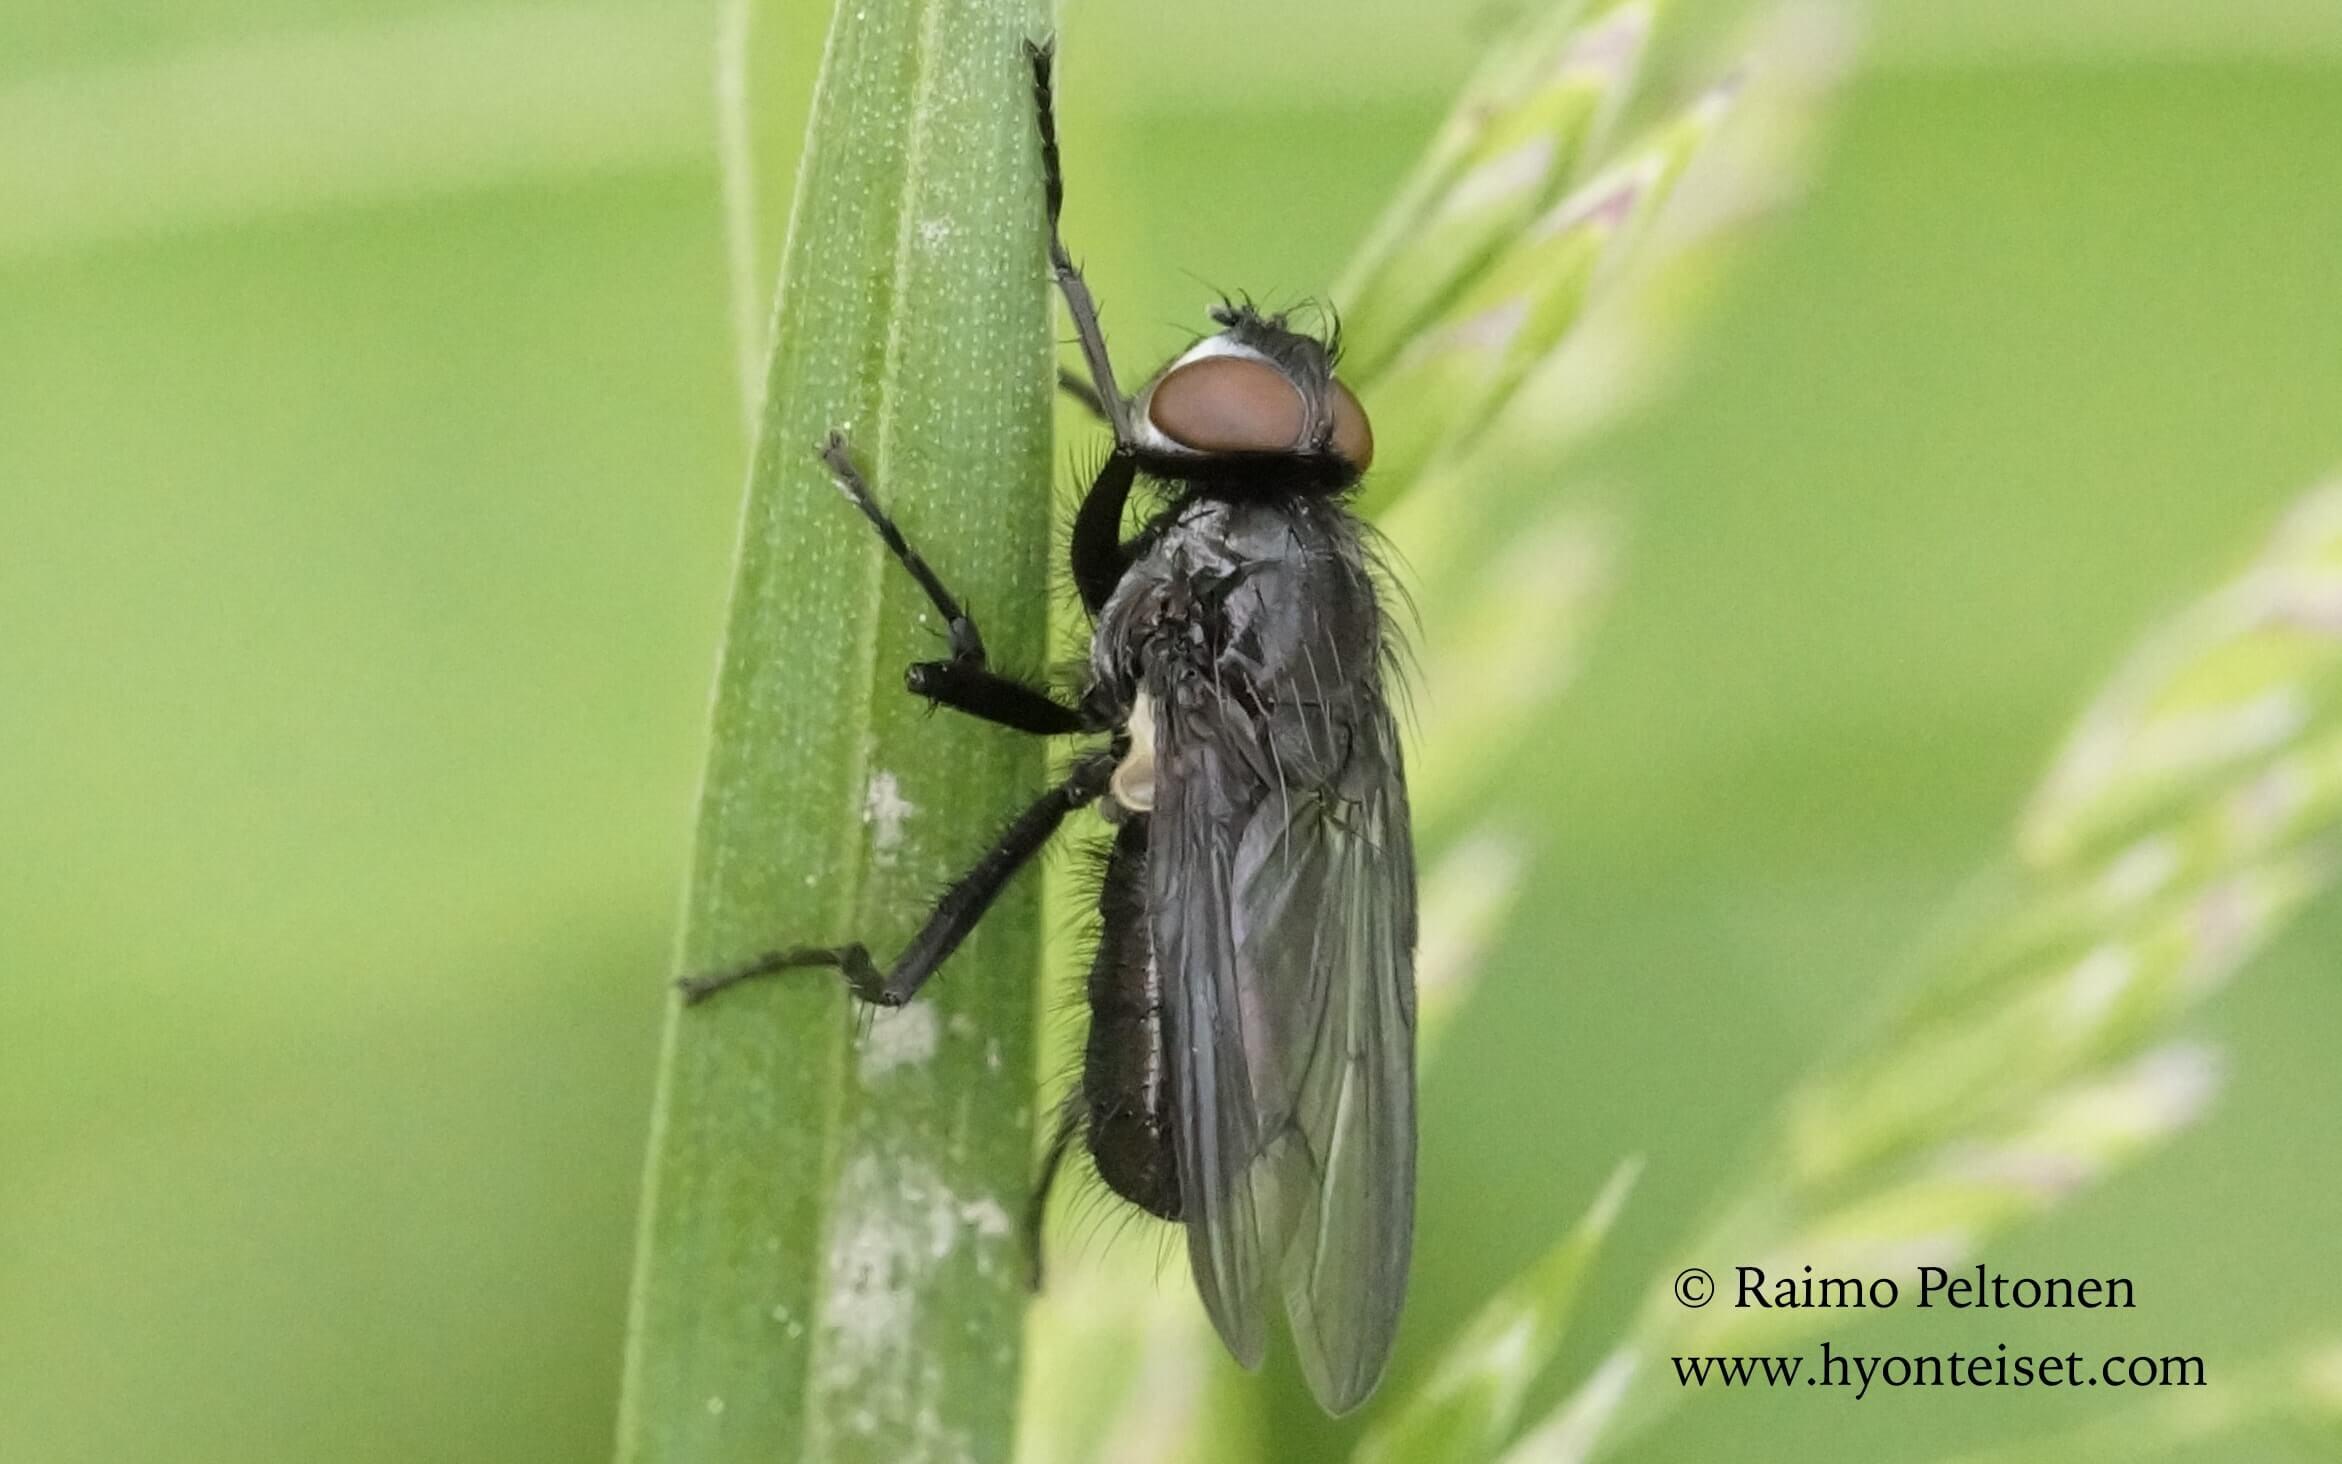 Moronia doronici (det. Stephane Lebrun)